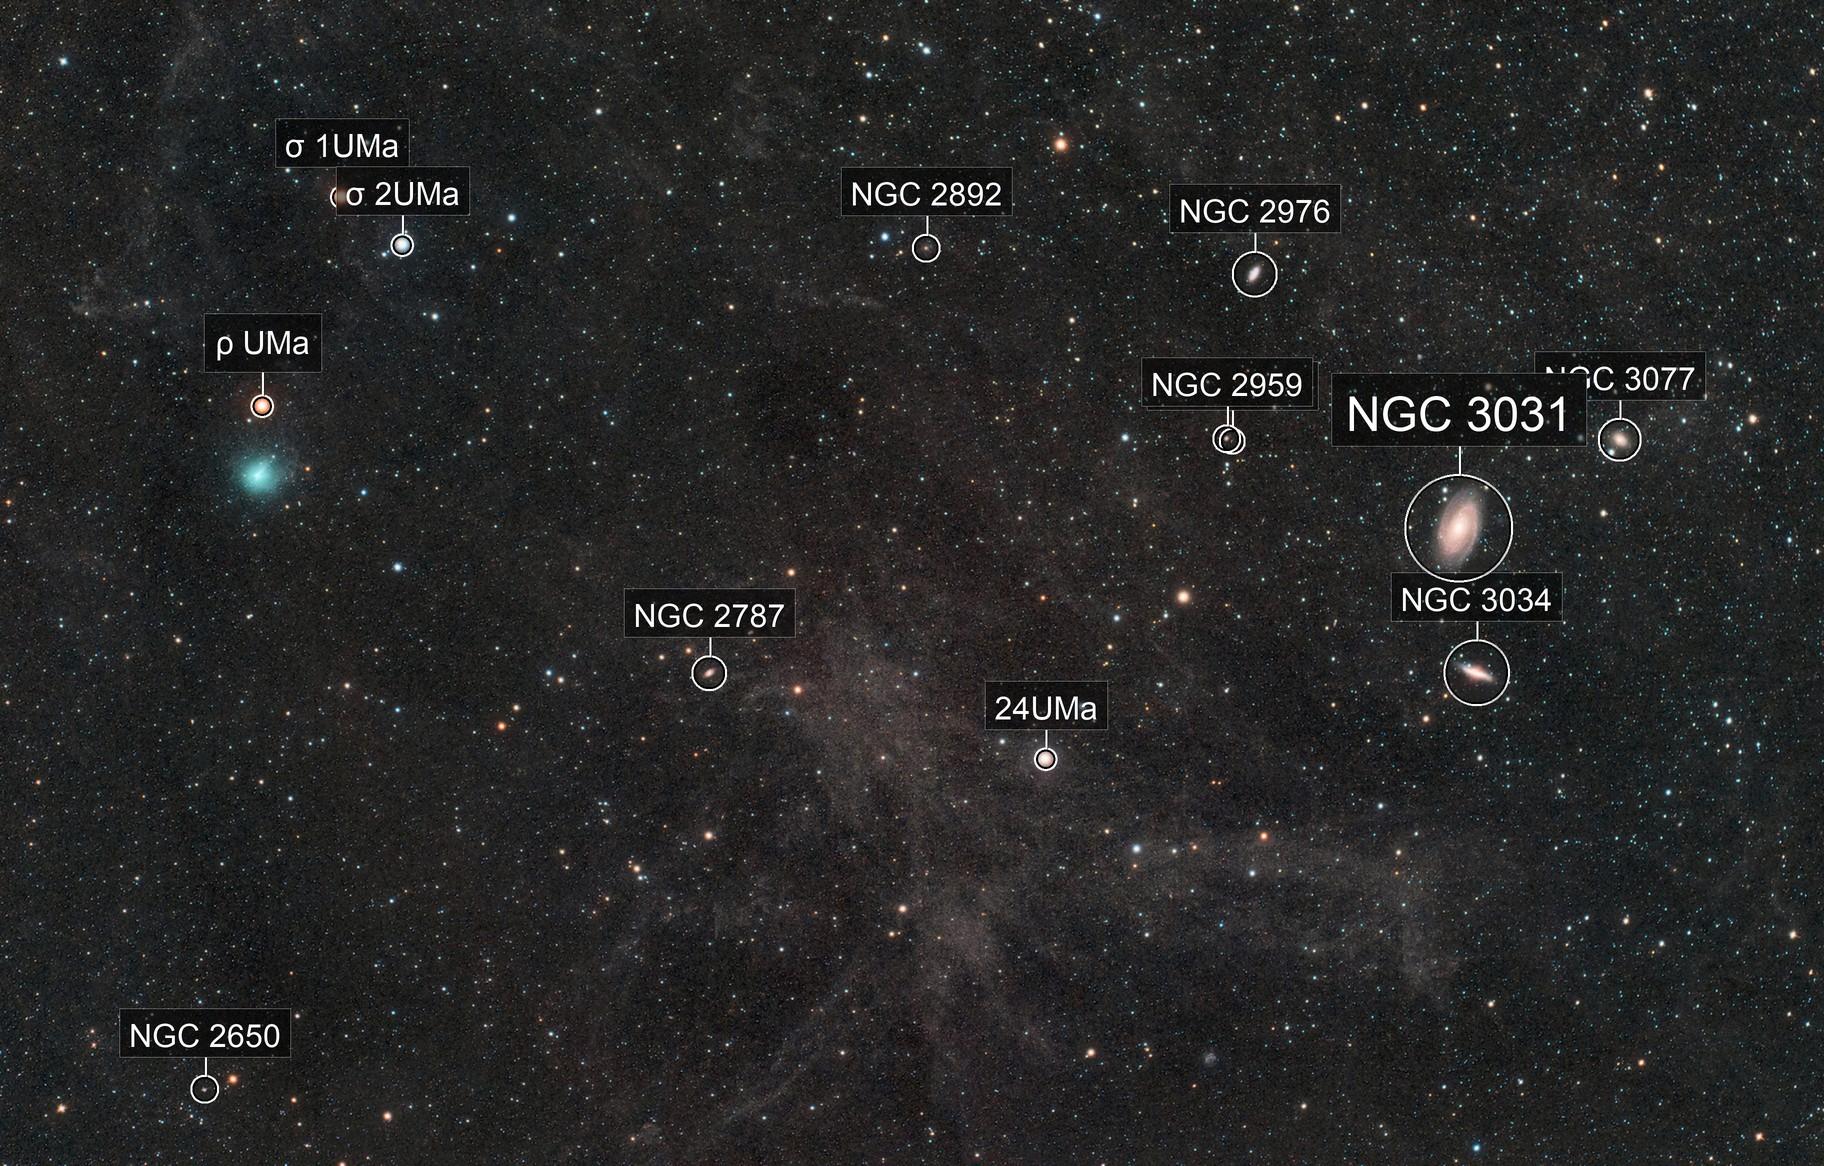 Comet C/2019 Y4 Atlas near M81 & M82 with IFN